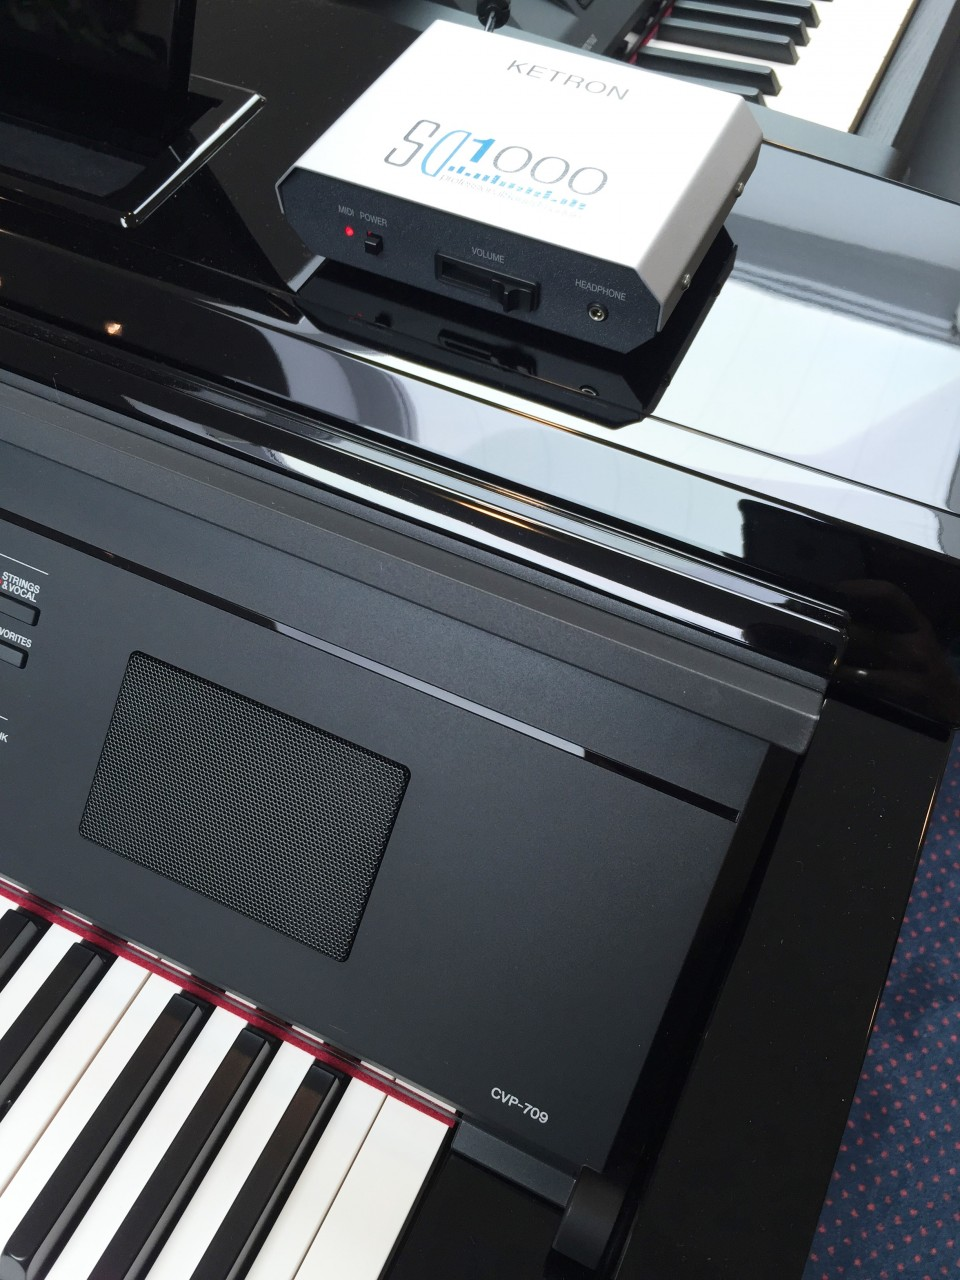 Ketron SD1000 incl. SoundPatch voor CVP-709